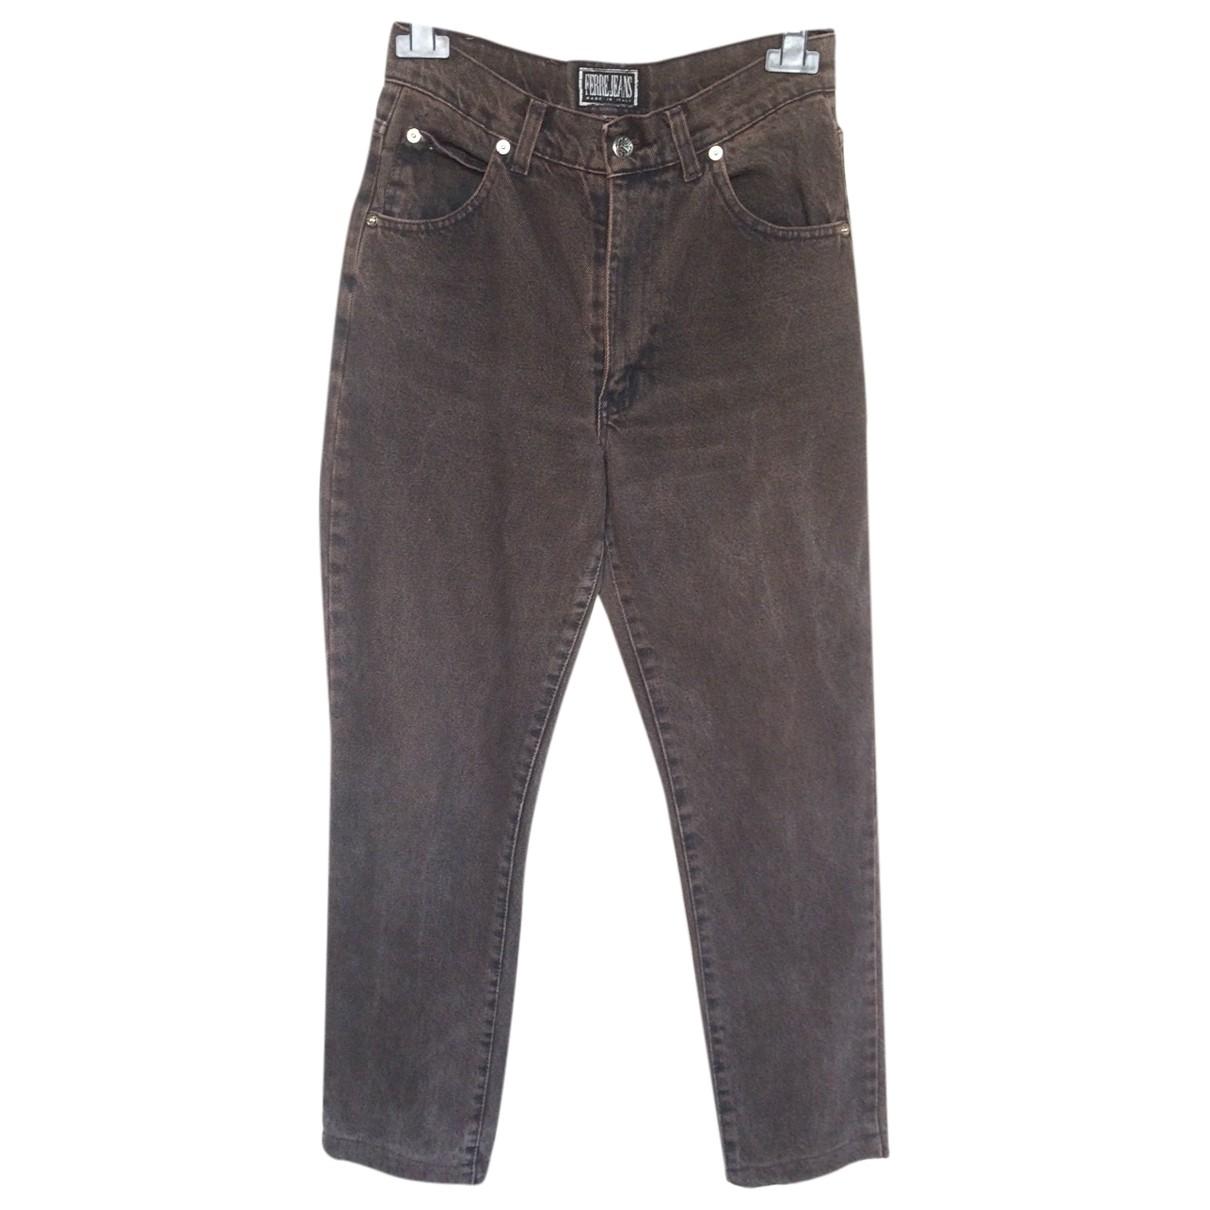 Gianfranco Ferré \N Grey Denim - Jeans Jeans for Women 32 US